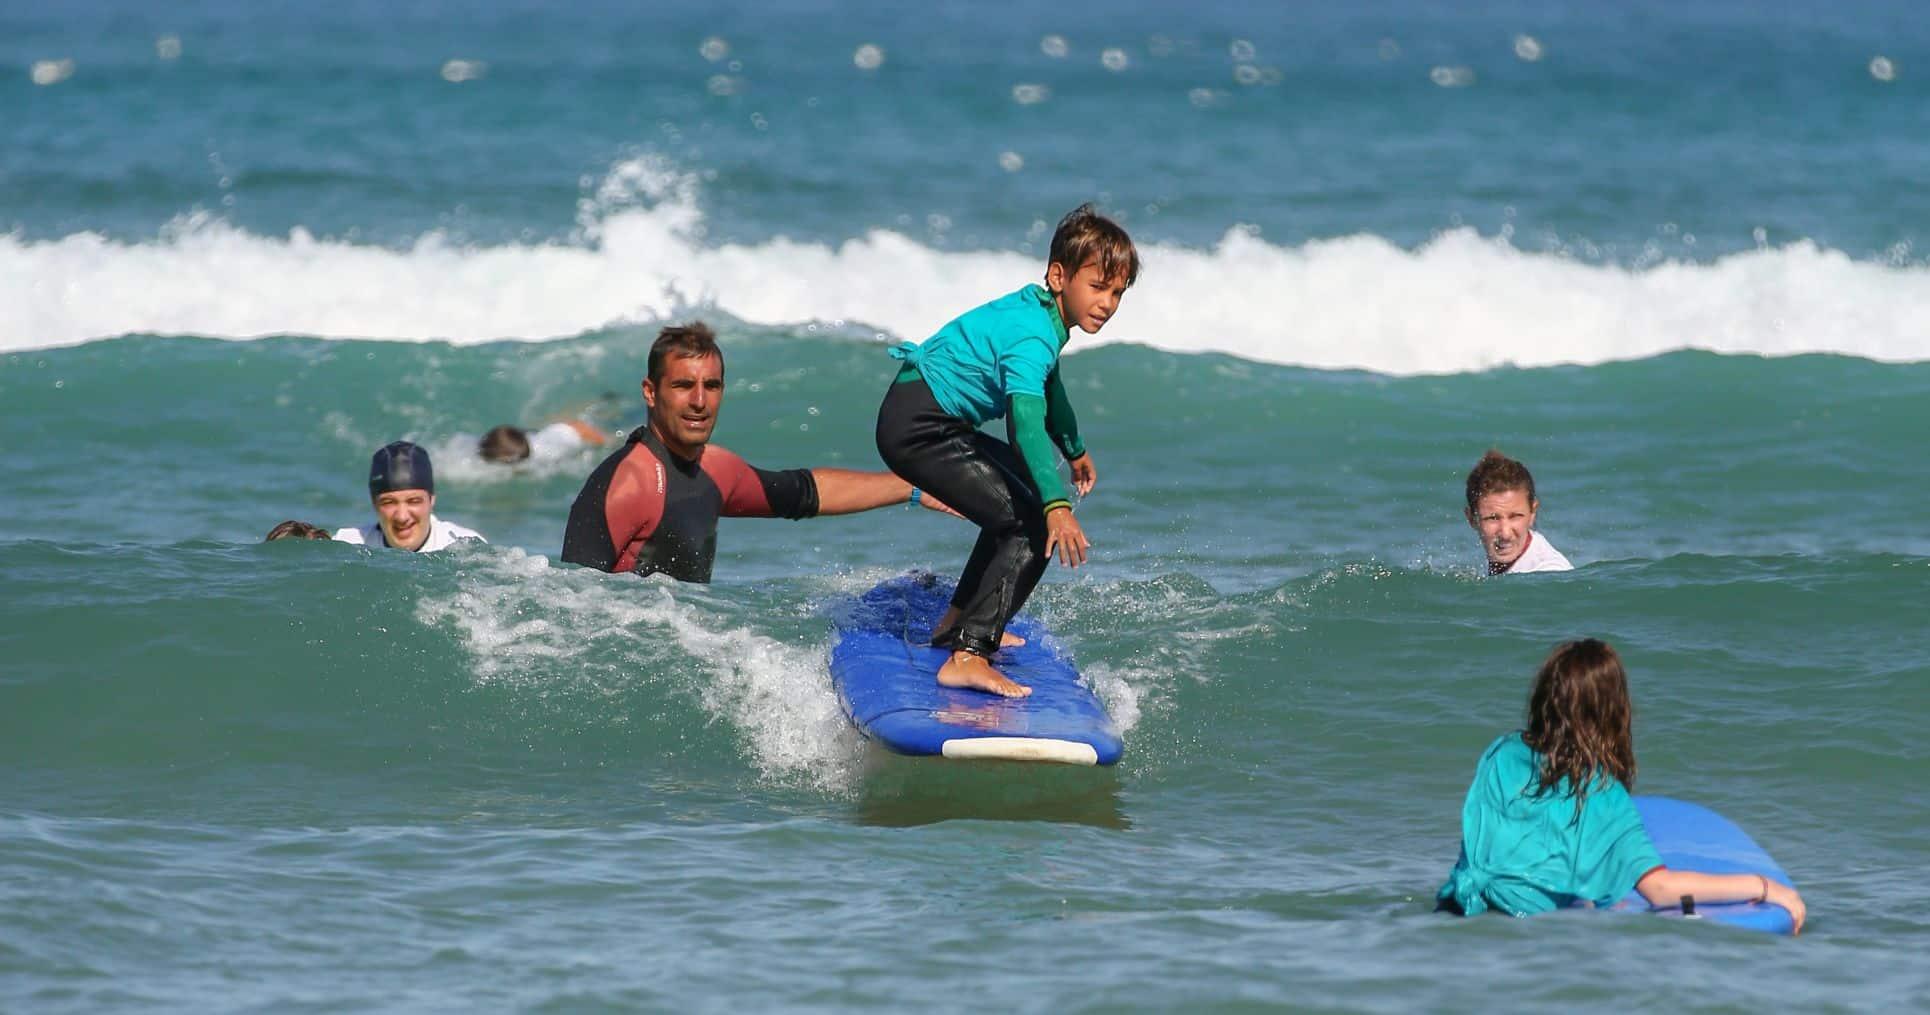 Ecole de Surf Bidart et Biarritz